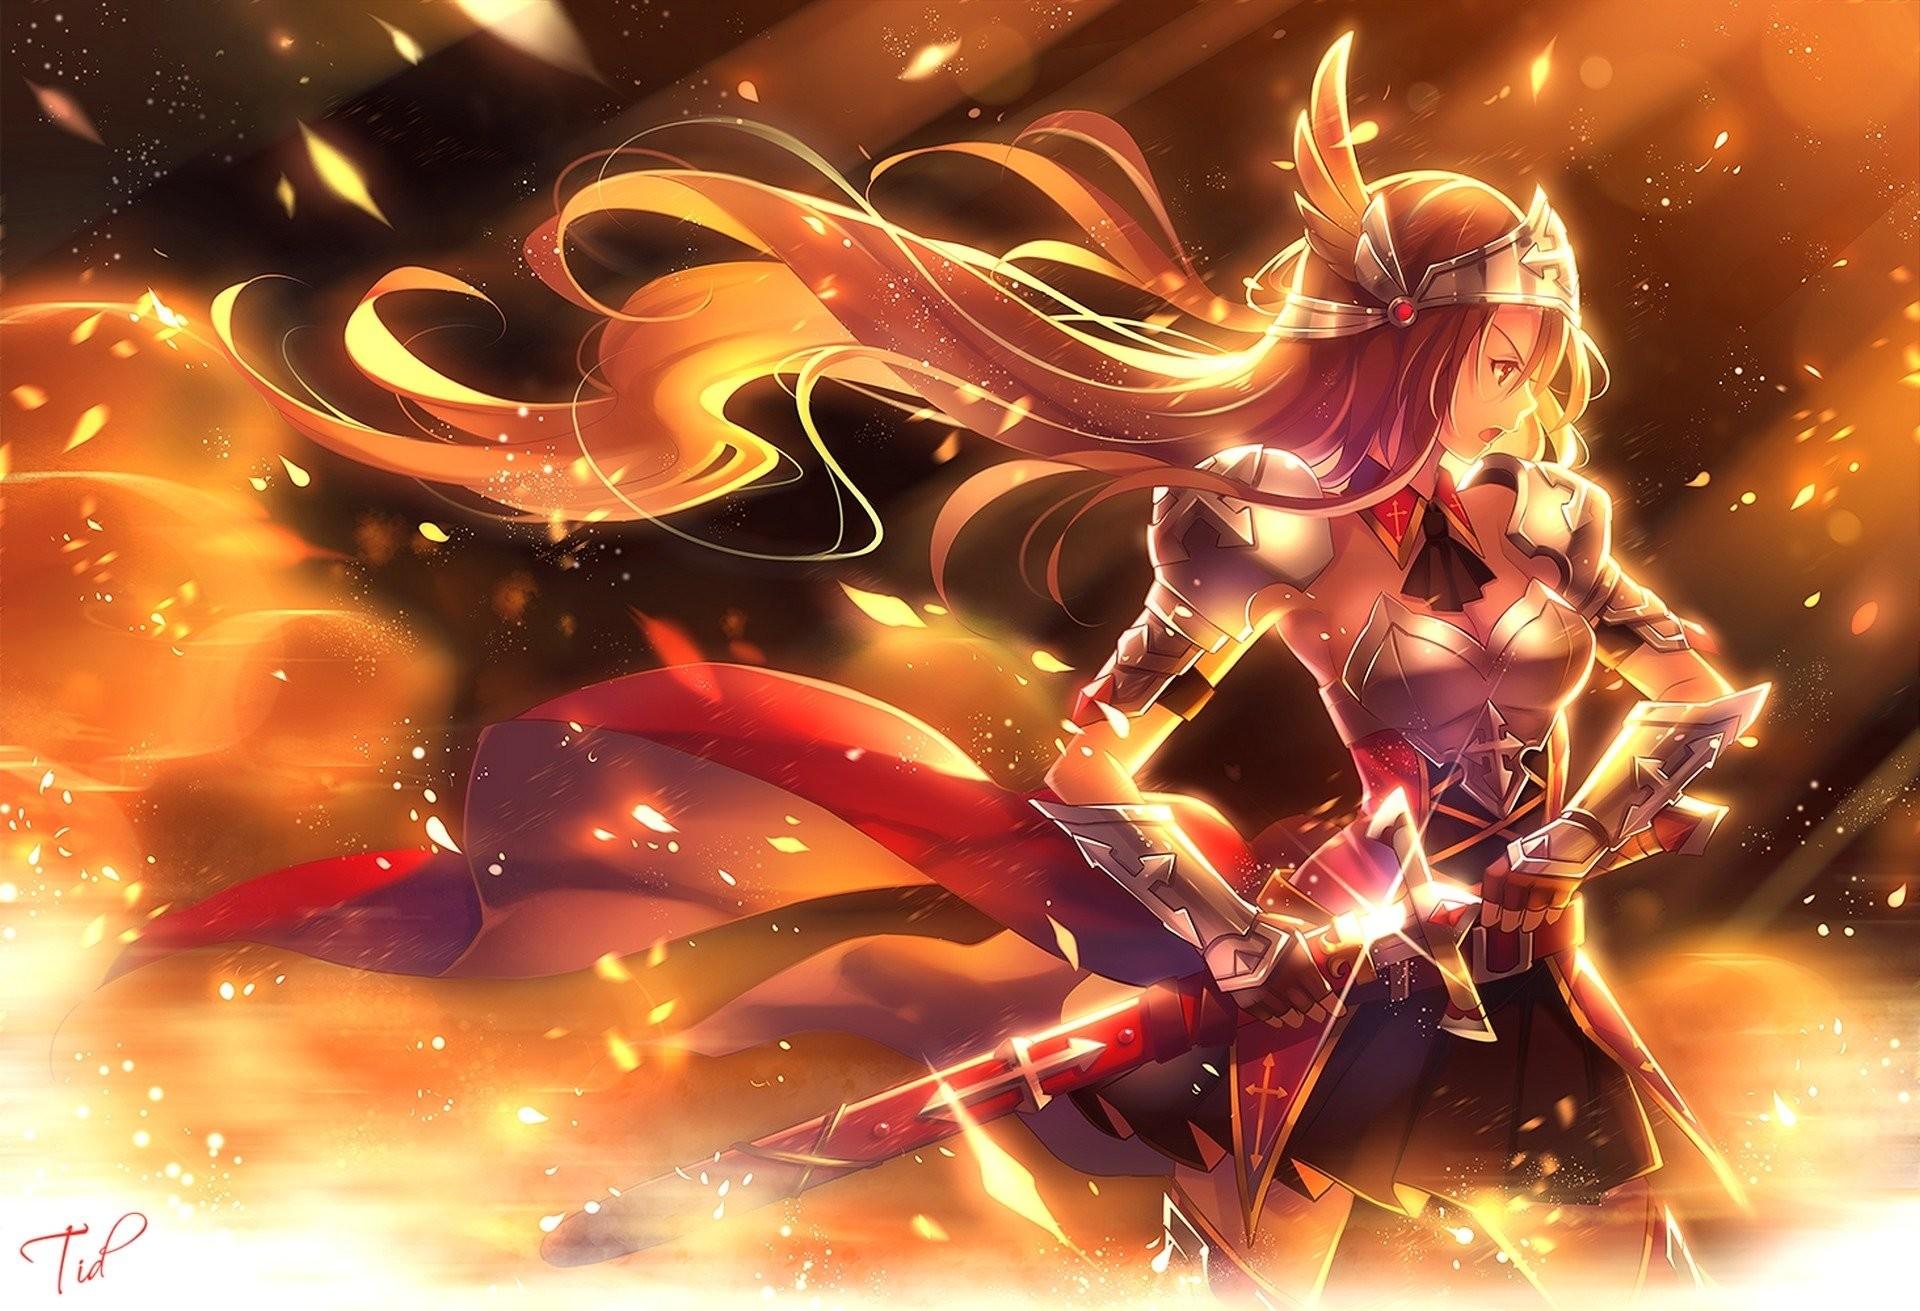 Anime – Original Blonde Armor Sword Anime Woman Warrior Girl Long Hair  Wallpaper